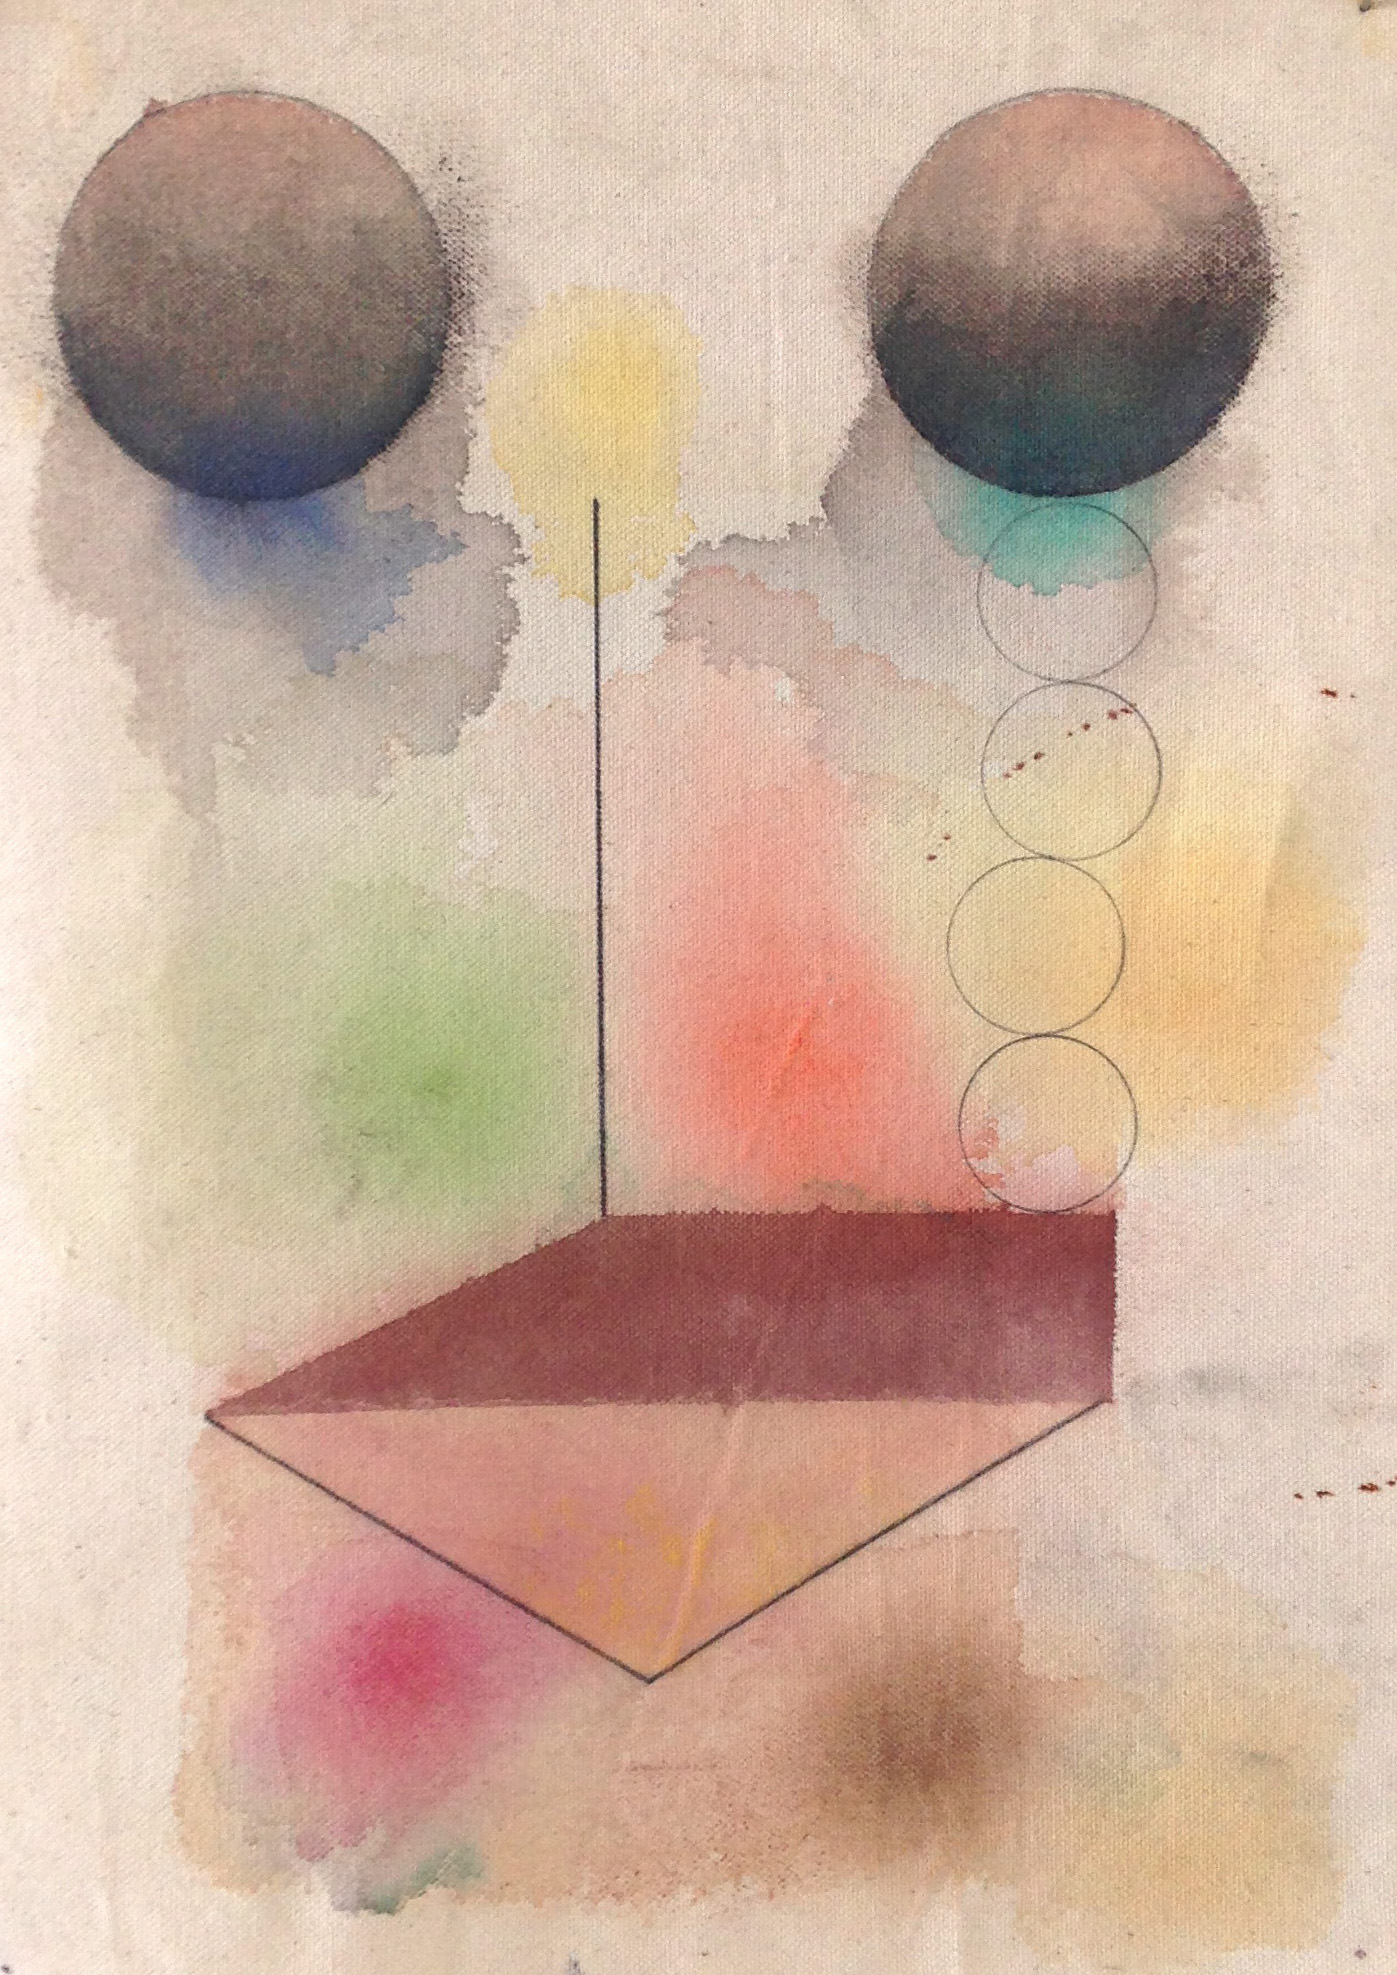 On Serdica, 2015, Pencil, gouache, pastel and canvas,39.5 x 28.5 cm